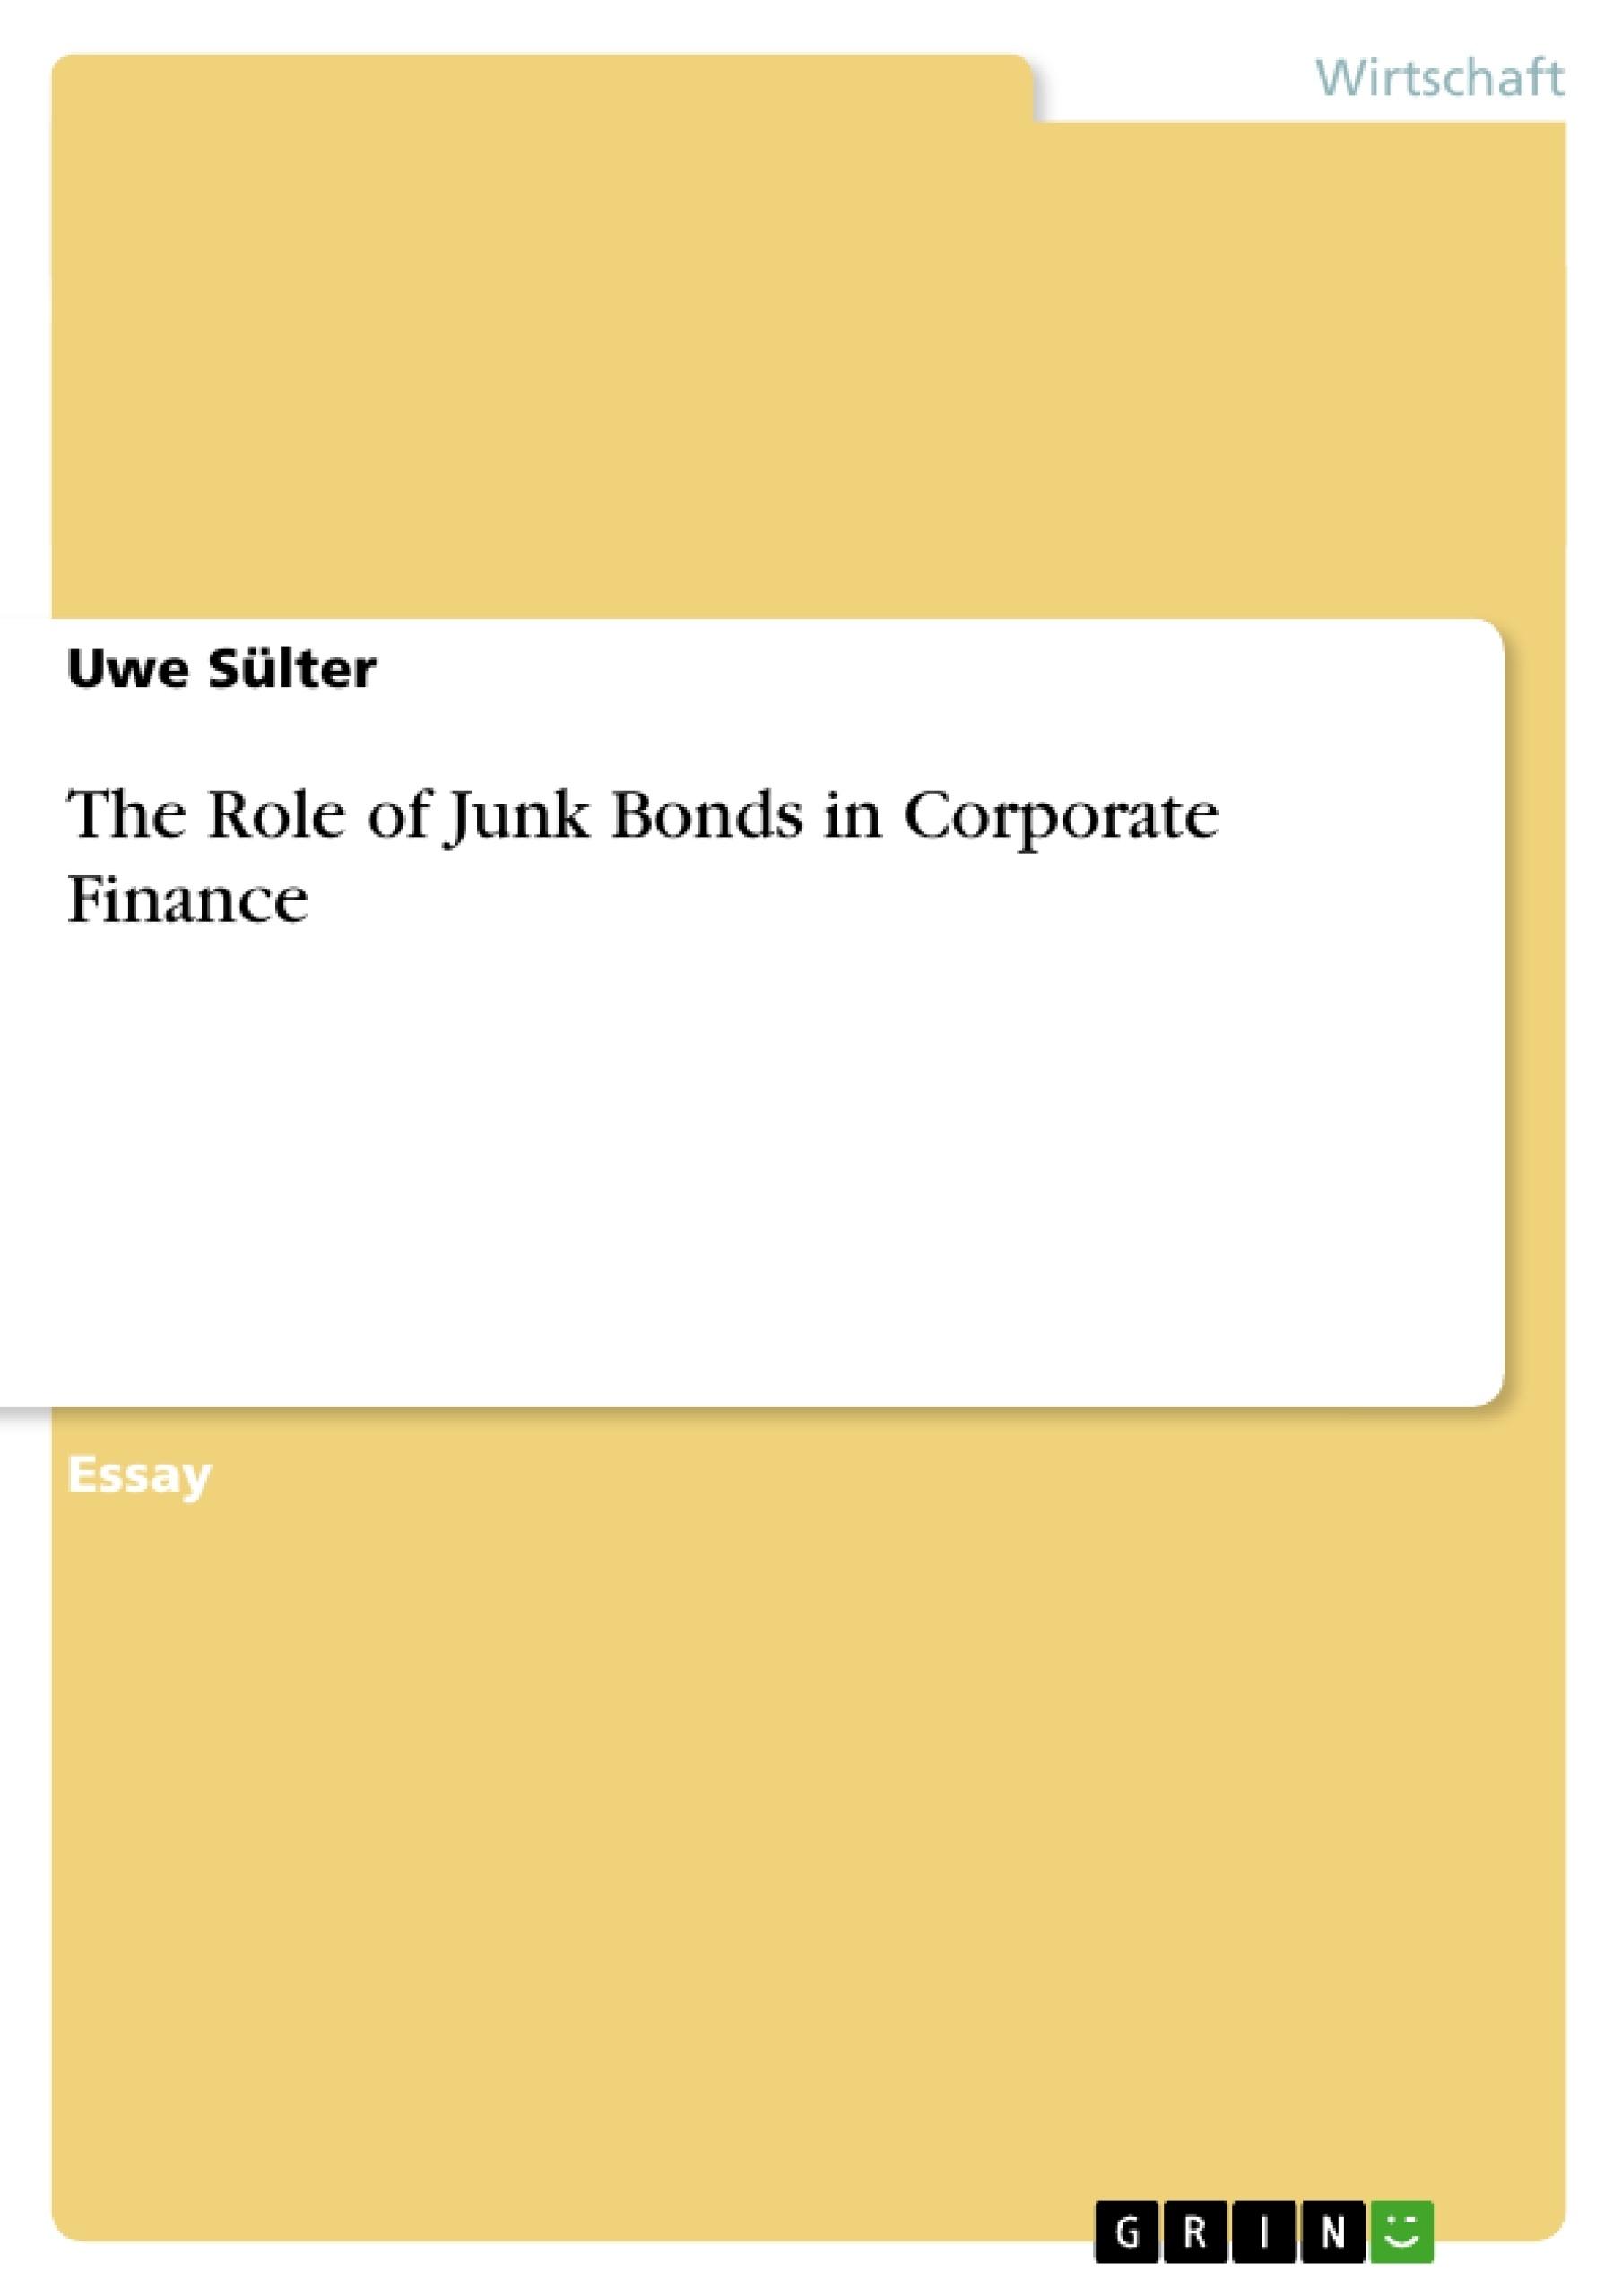 Titel: The Role of Junk Bonds in Corporate Finance